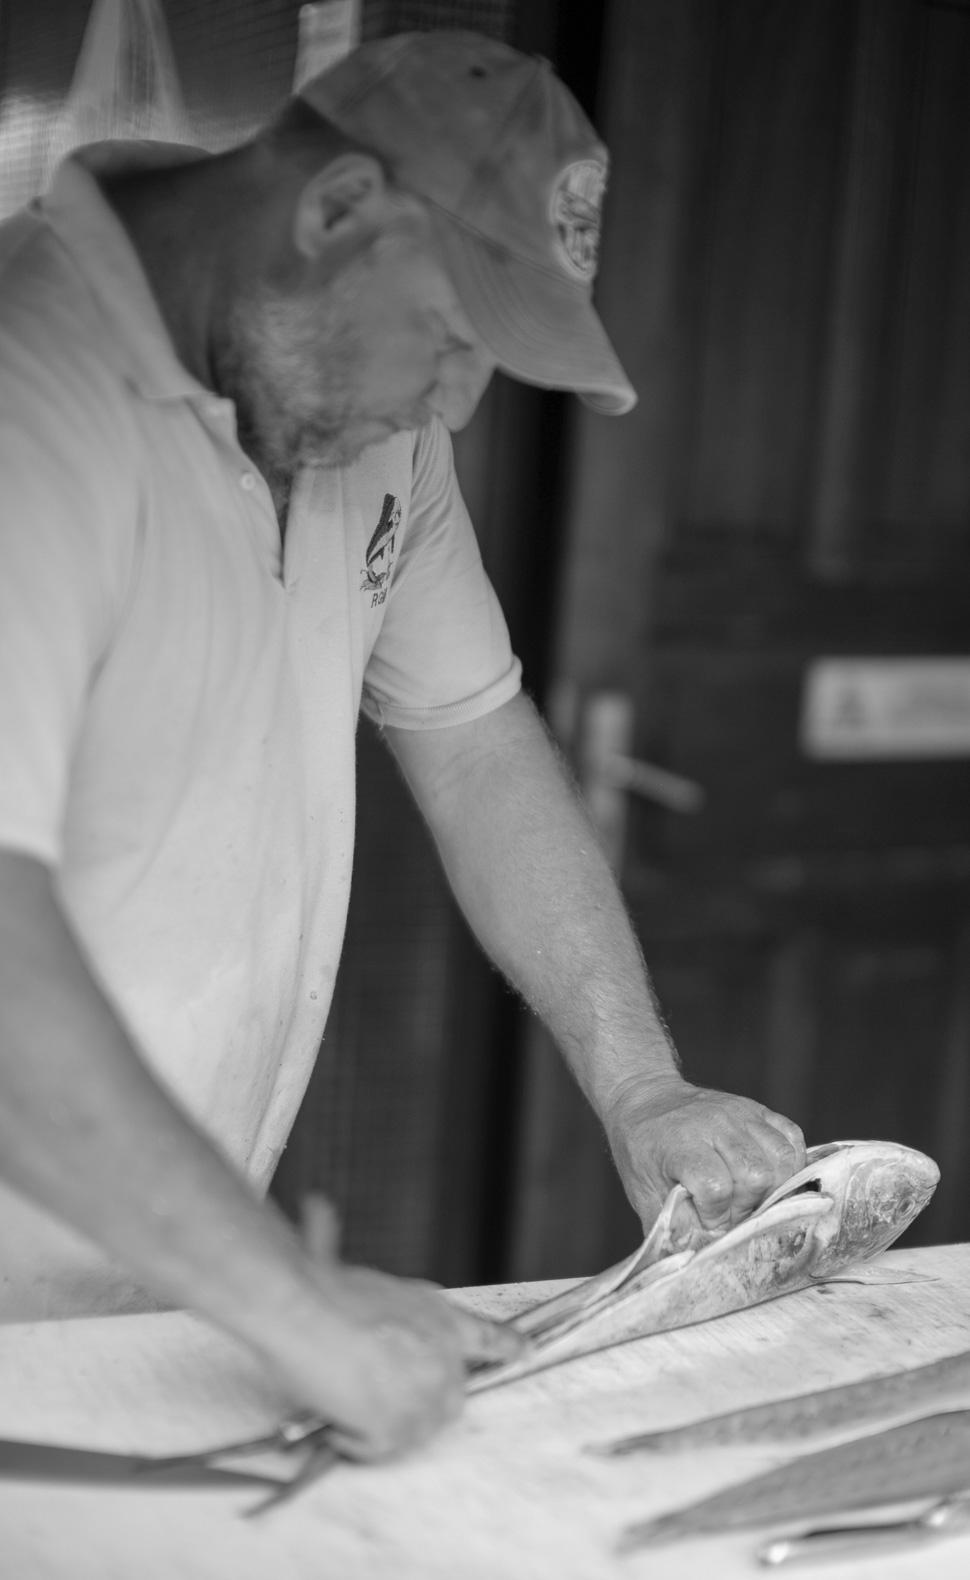 Fisherman at Fish Market / Pêcheur à la Poissonnerie  - Gustavia